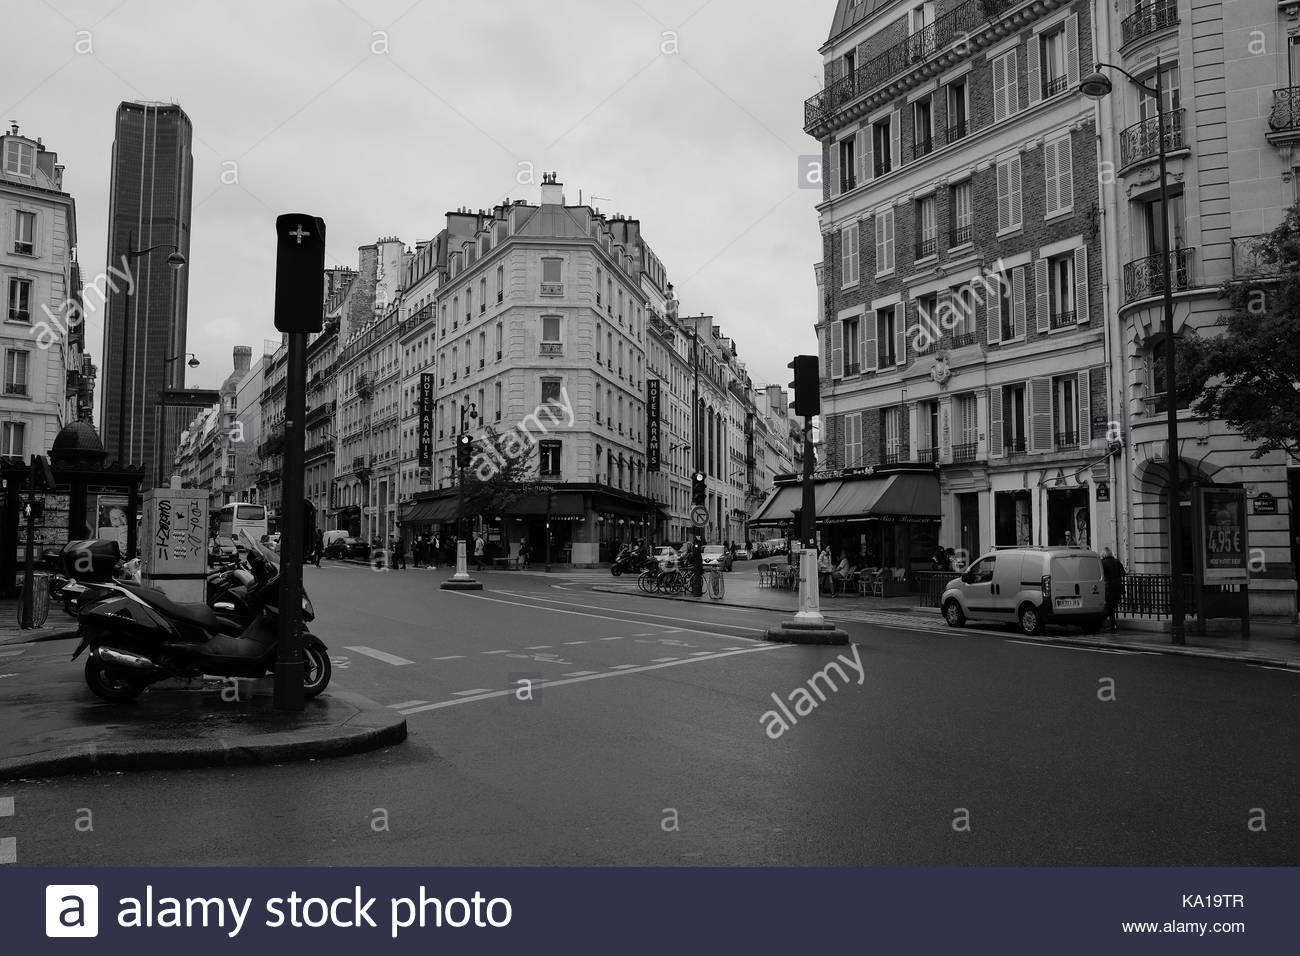 Aramis Paris : aramis stock photos aramis stock images alamy ~ Gottalentnigeria.com Avis de Voitures